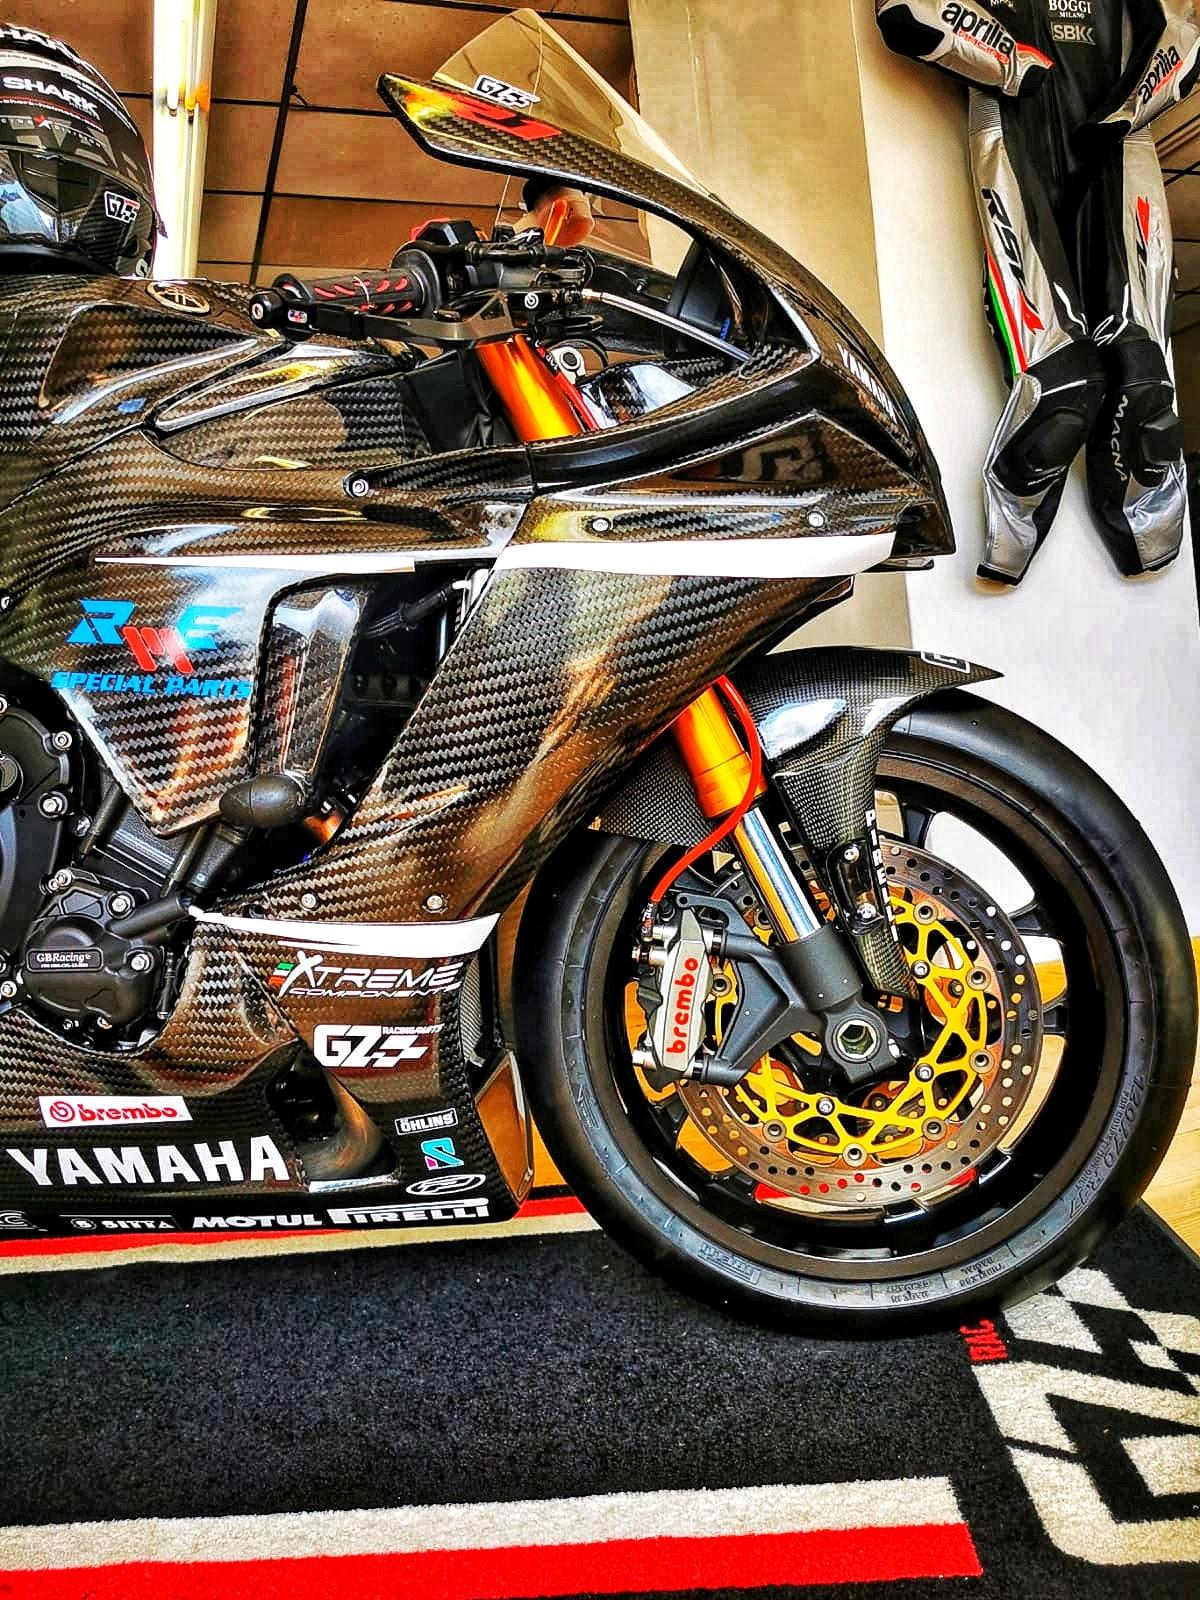 Yamaha R1 et R1M  Crossplane 2015 ( sujet numero3 ) - Page 12 11802510